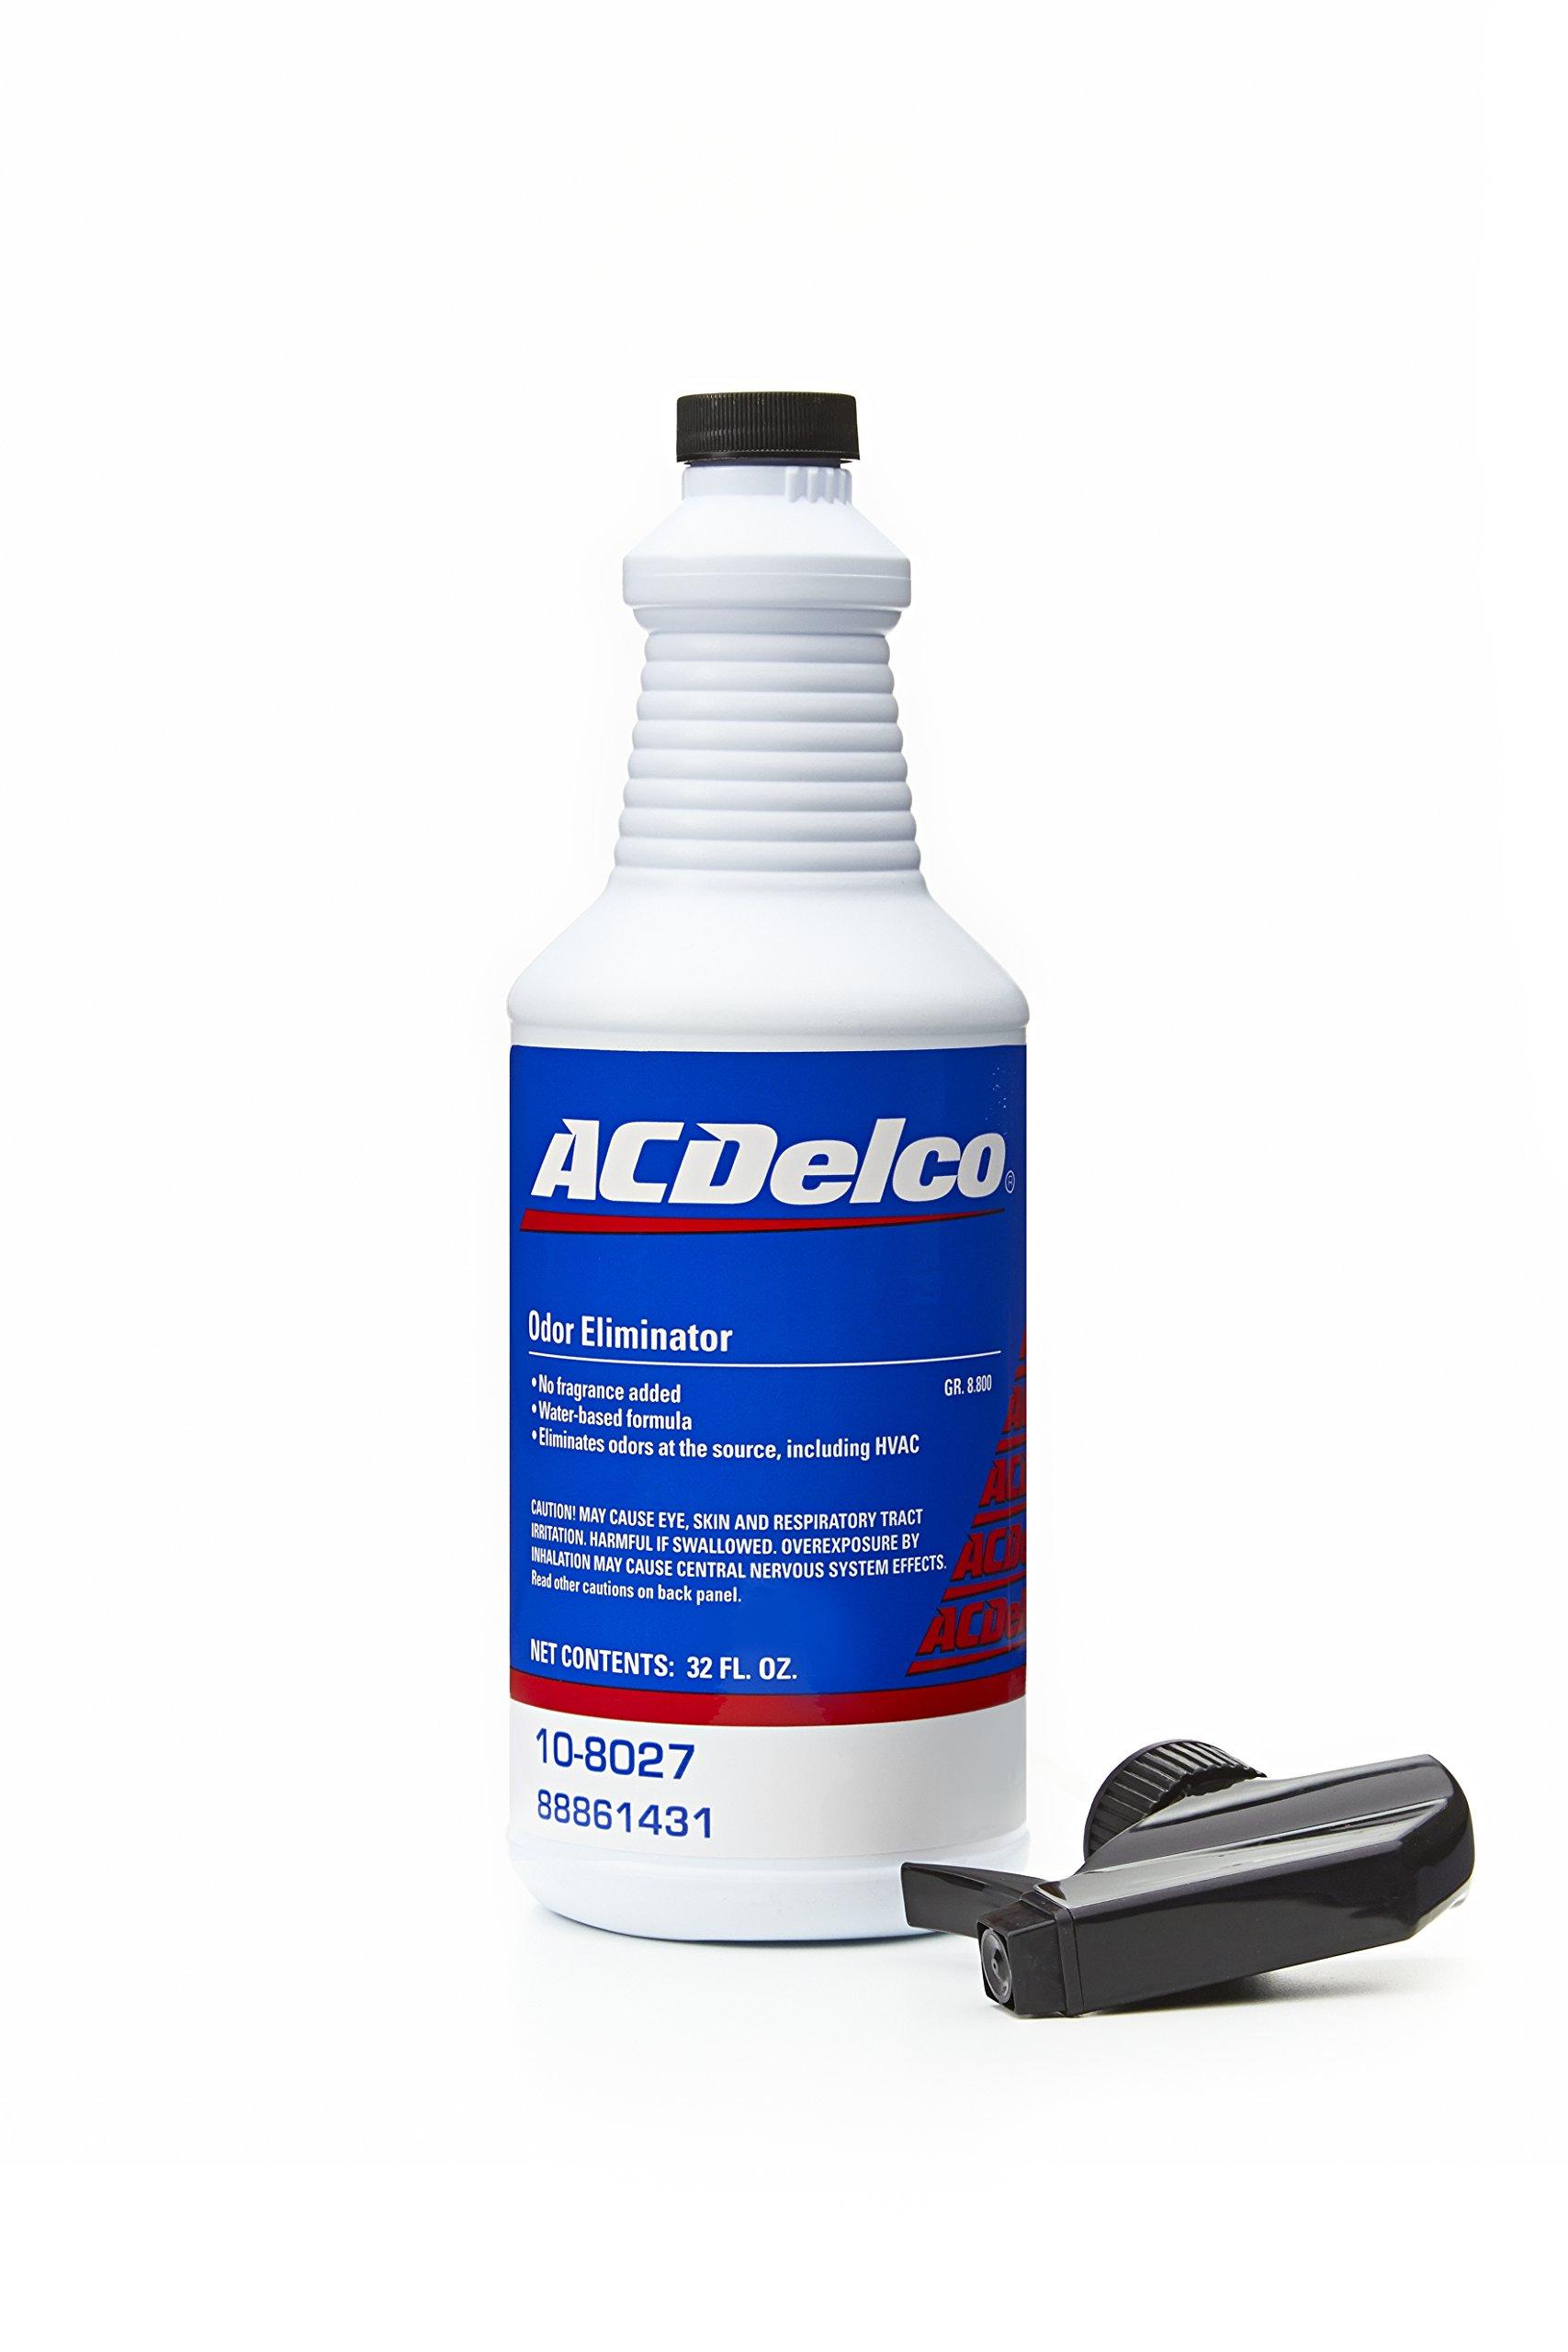 ACDelco 10-8027 Vehicle Odor Eliminator - 32 oz Spray